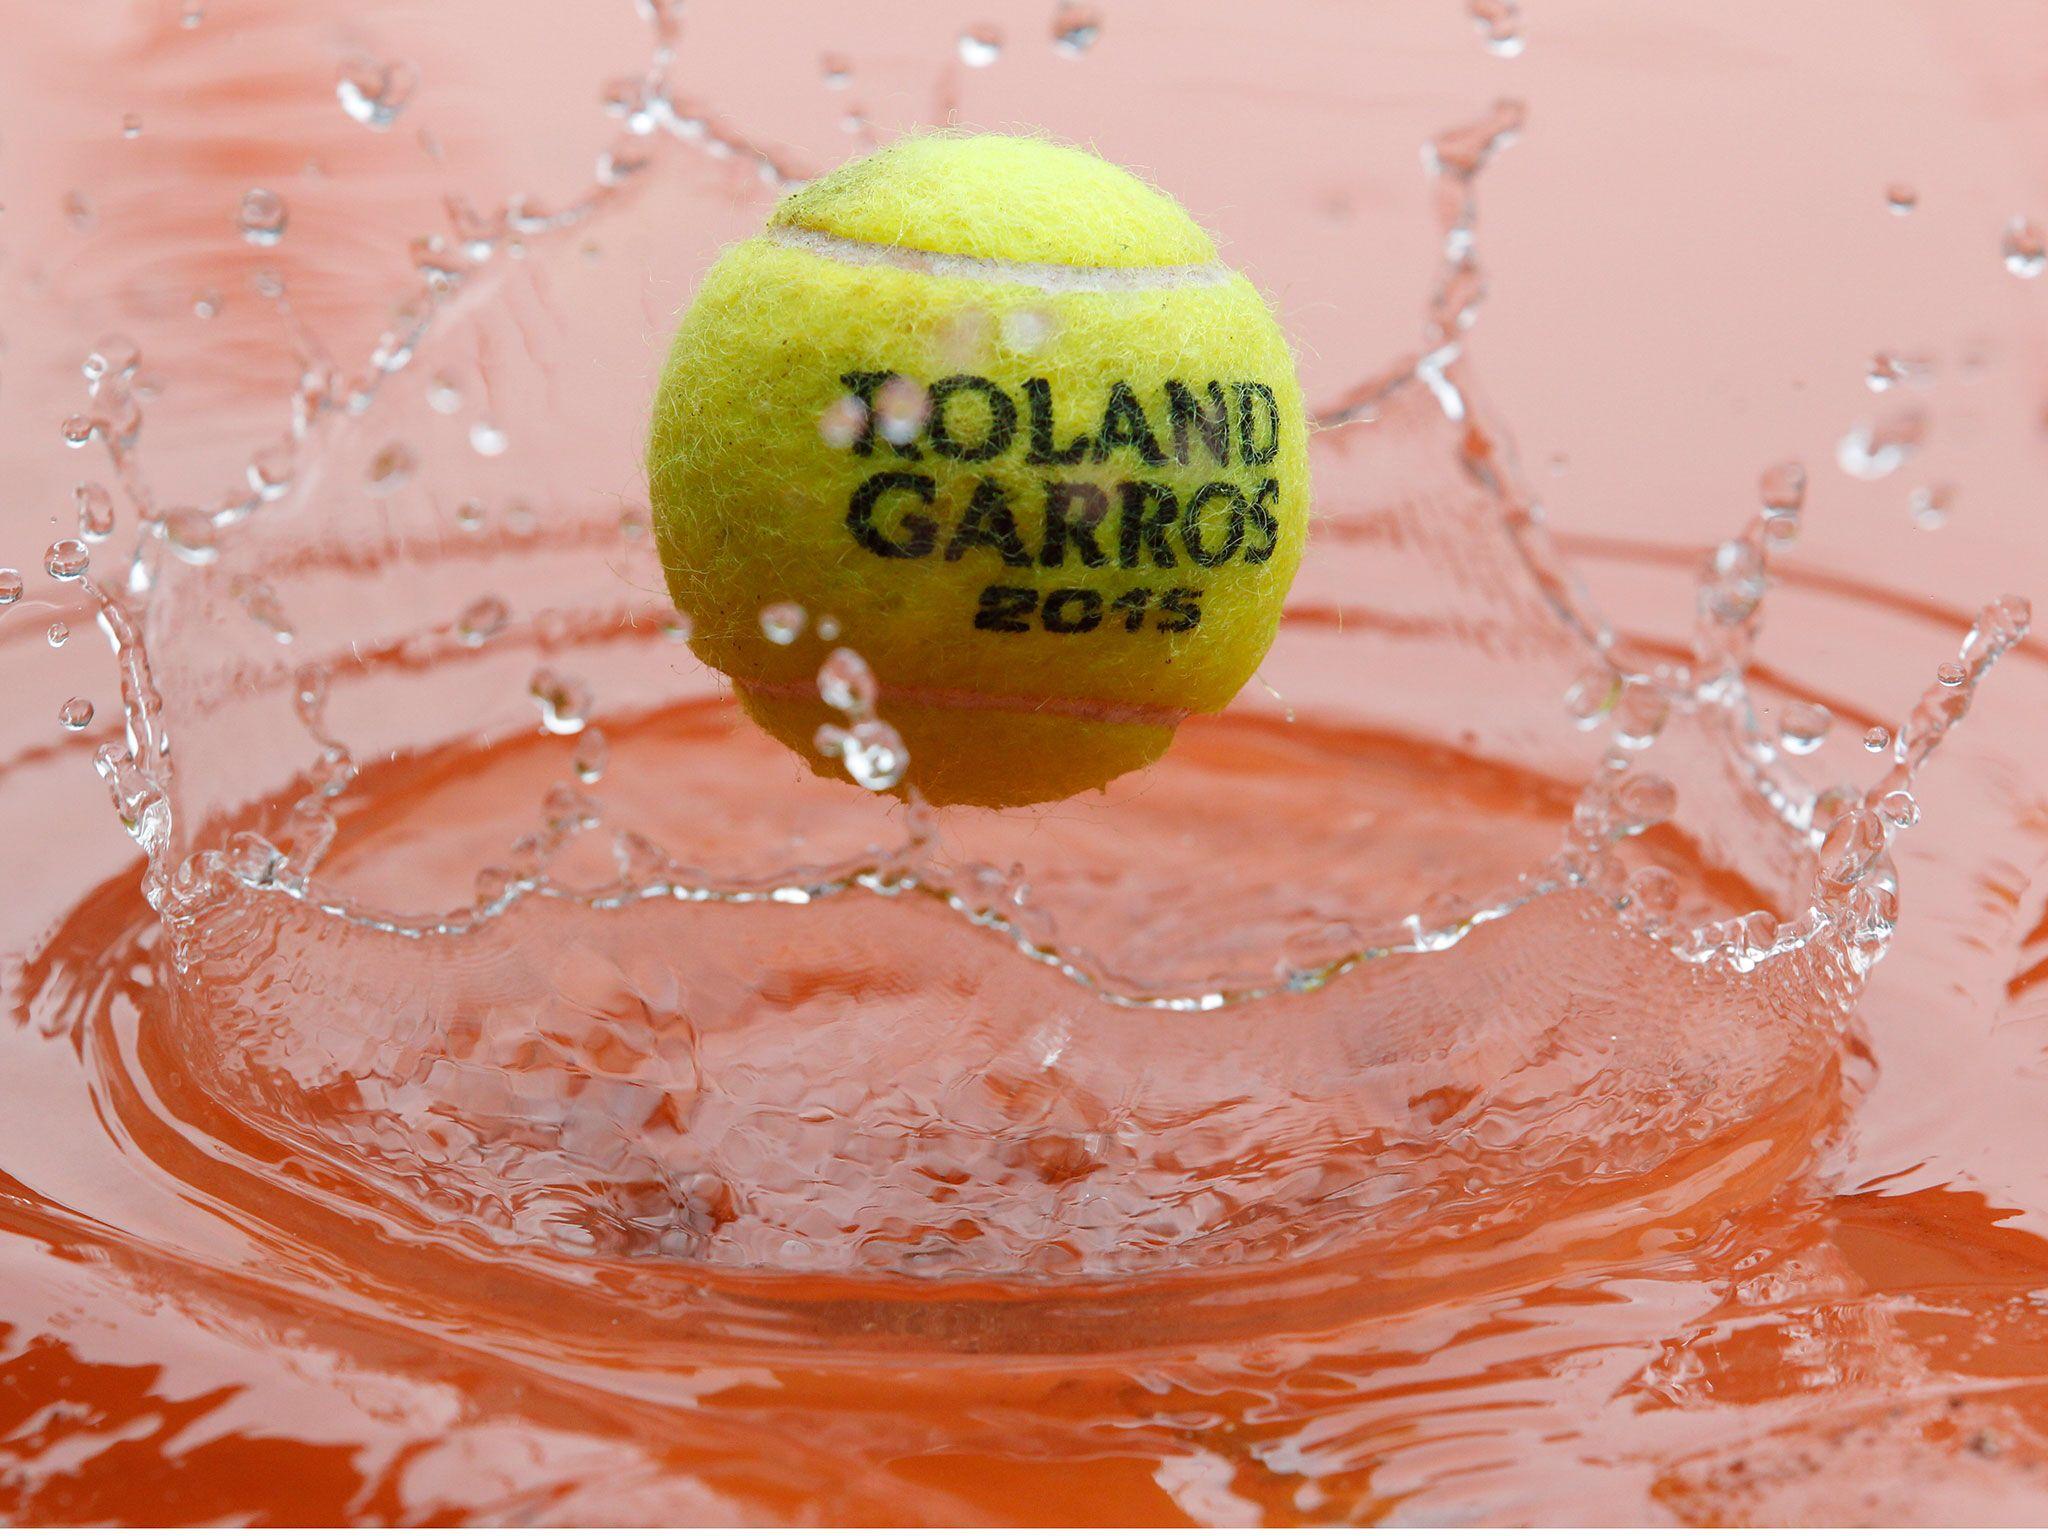 The tennis balls have some fun splashing around in the